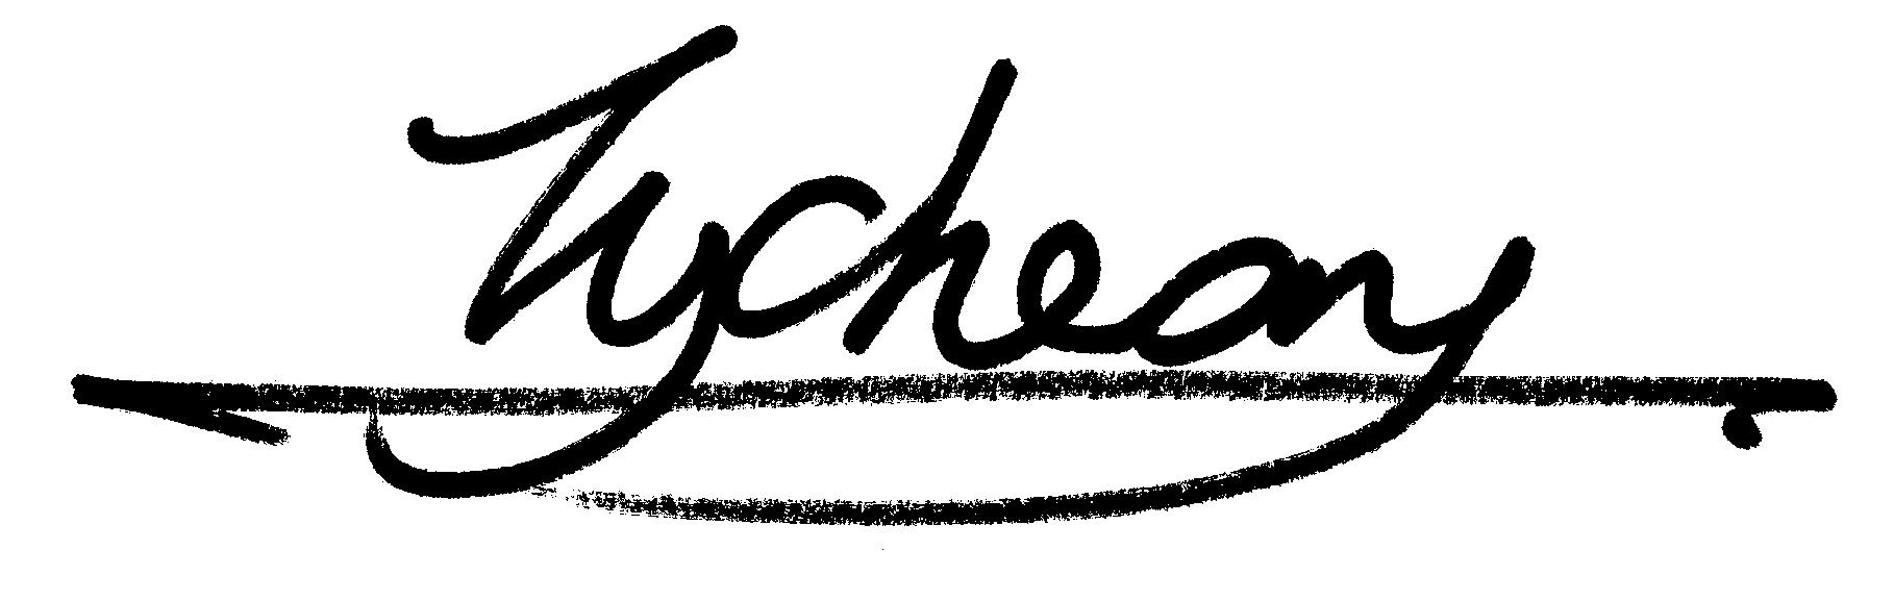 Tuckwai Cheong Signature